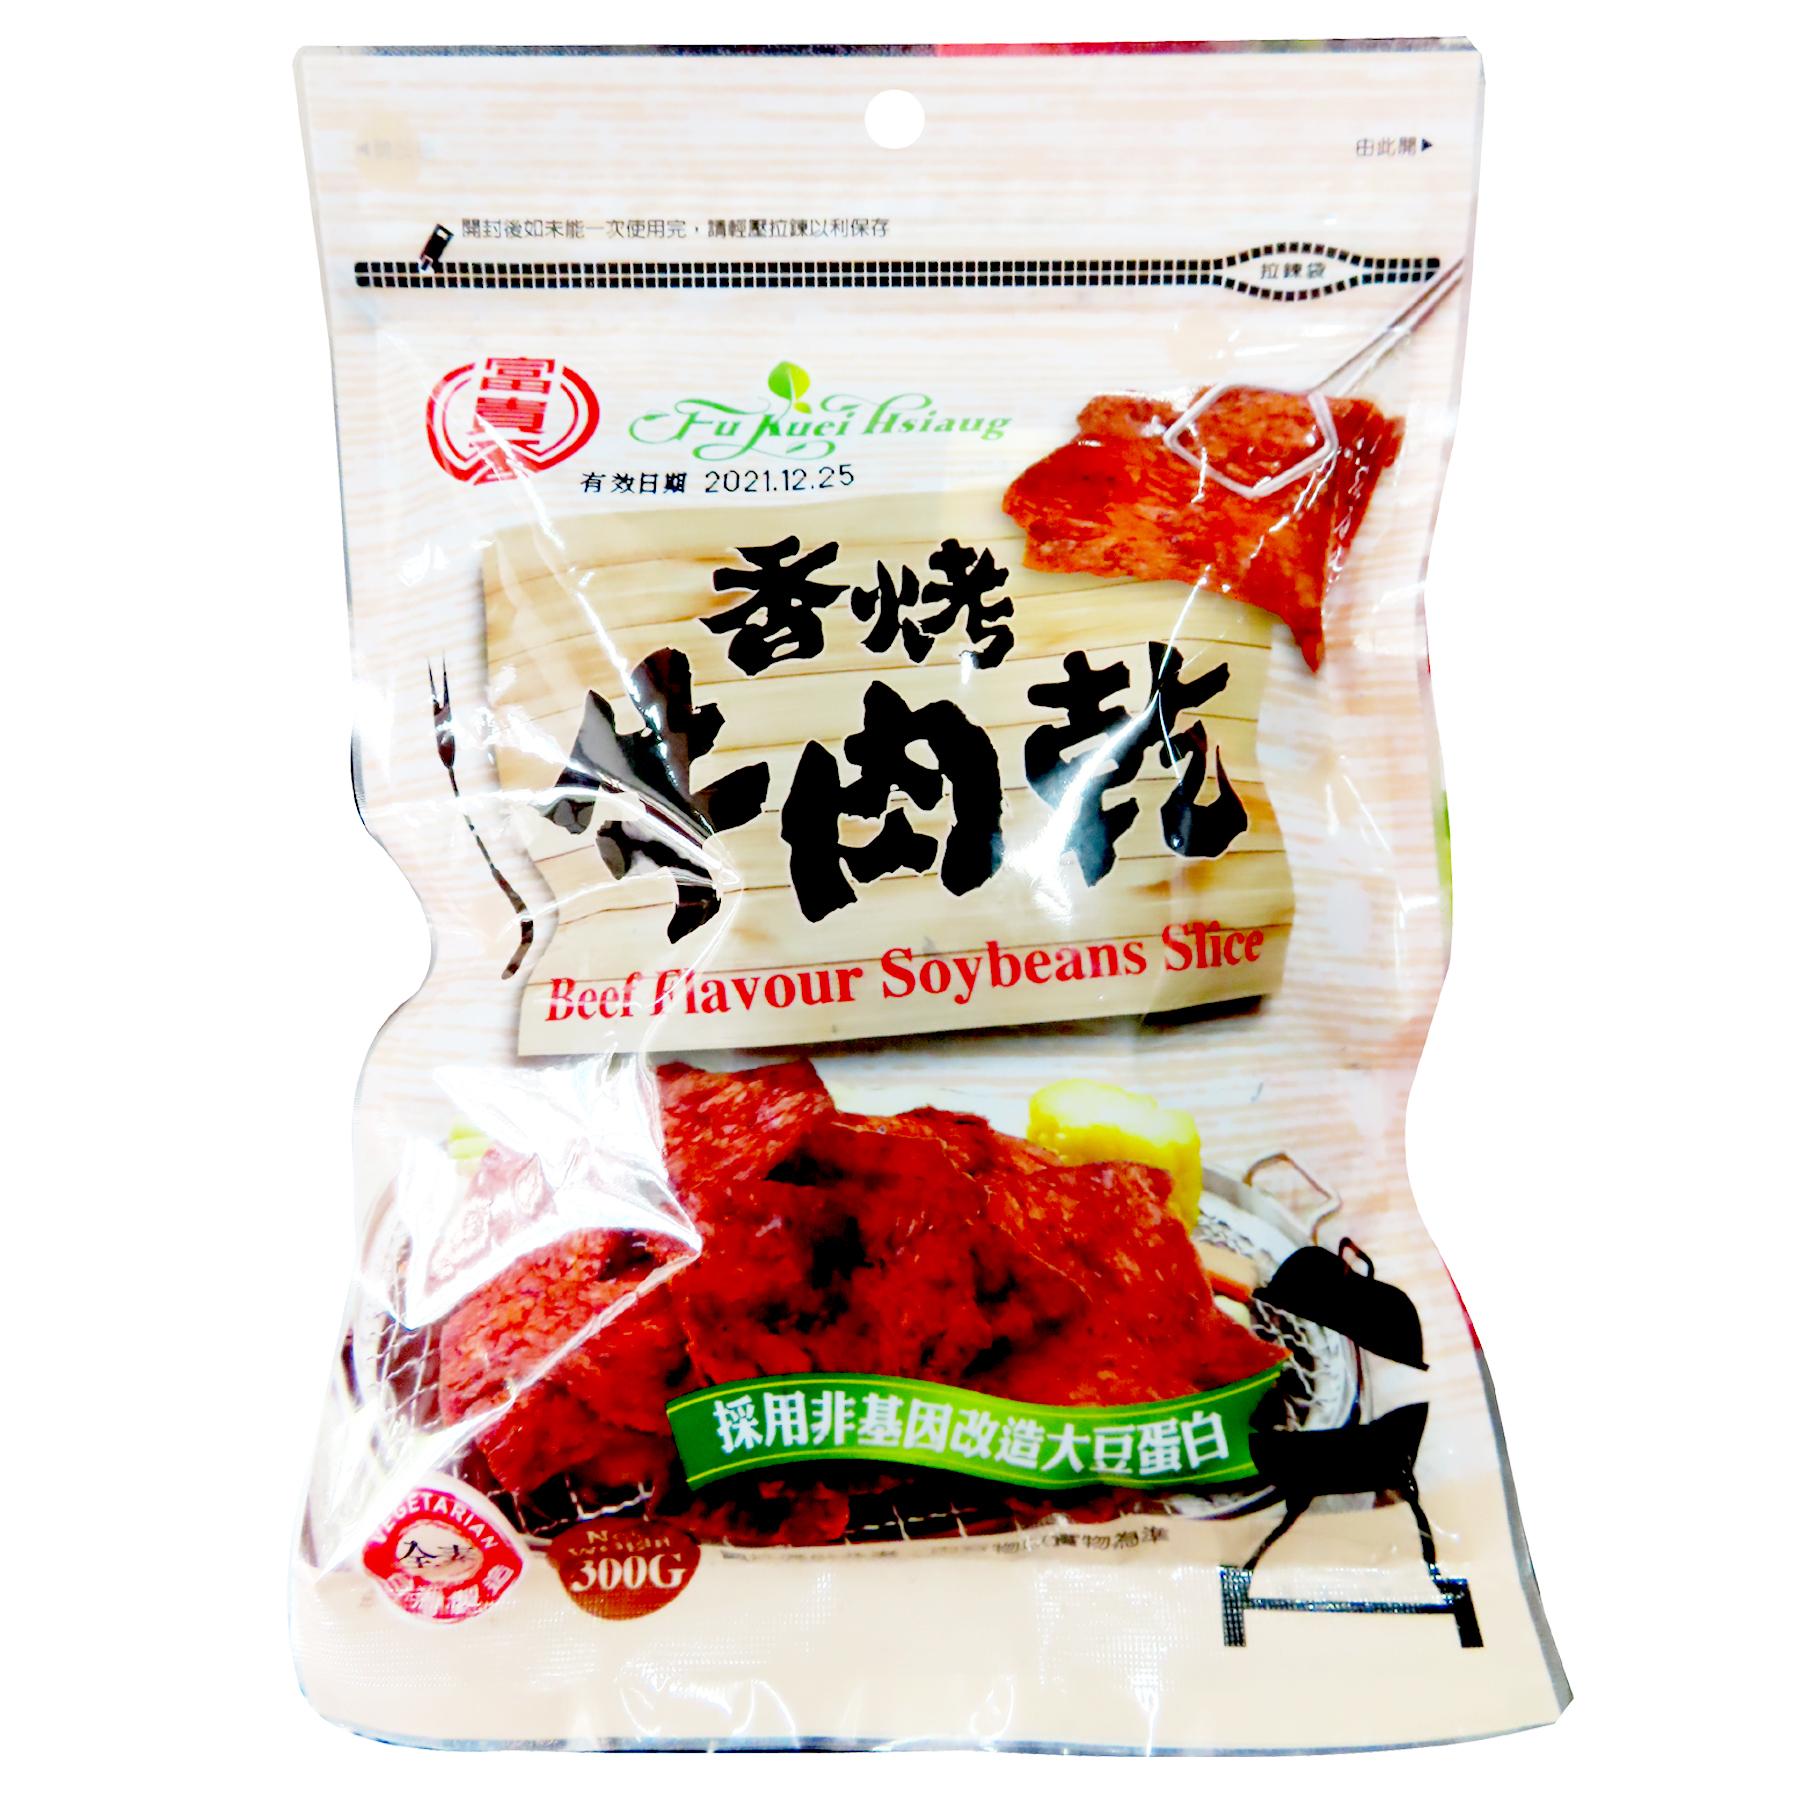 Image Beef Flavour Soybeans Slice 富贵香 - 香烤牛肉干 300grams